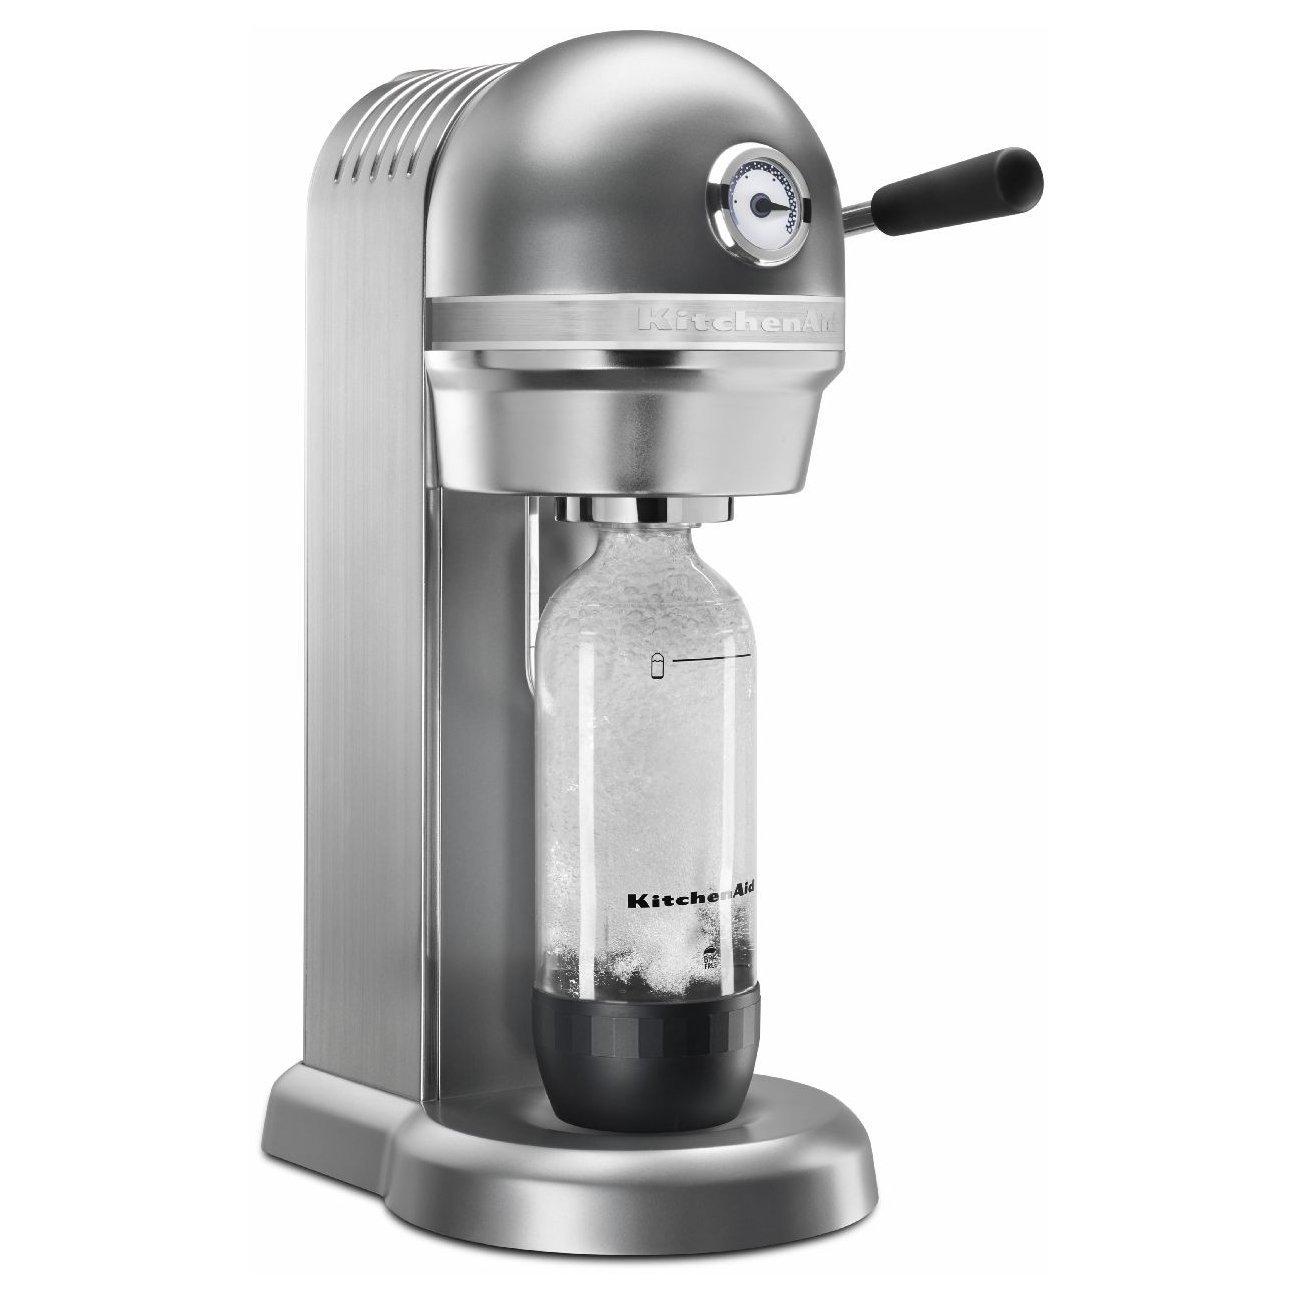 KitchenAid KSS1121CU Sparkling Beverage Maker, Contour Silver Via Amazon